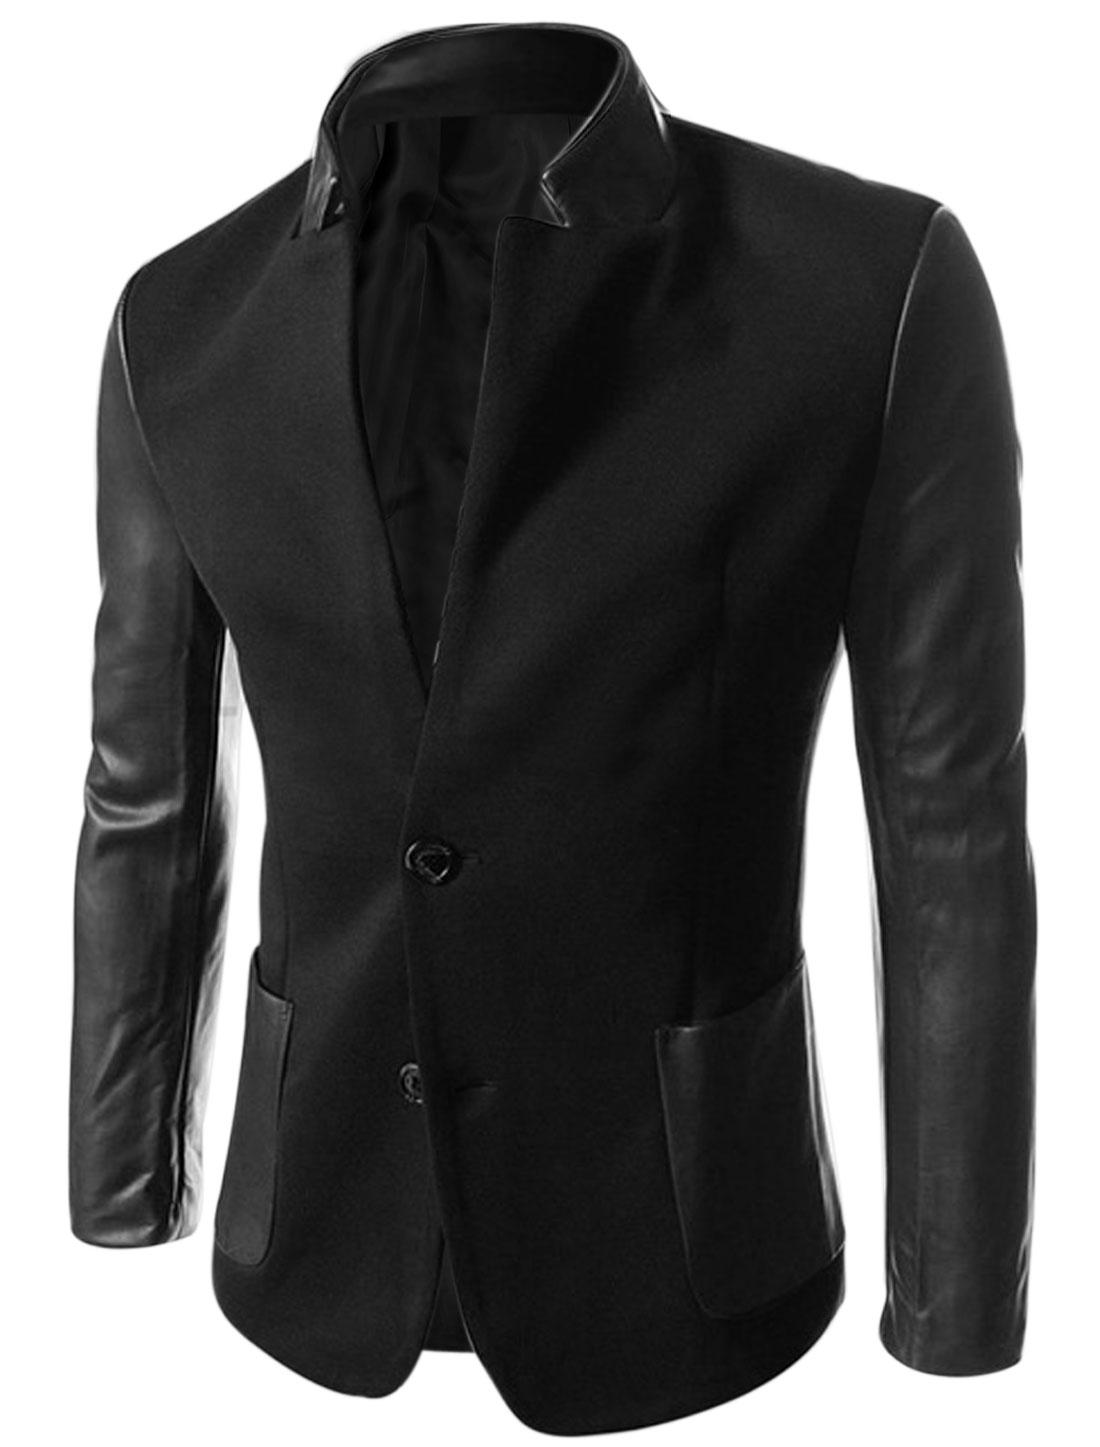 Men Imitation Leather Panel Padded Shoulder Casual Jacket Black M